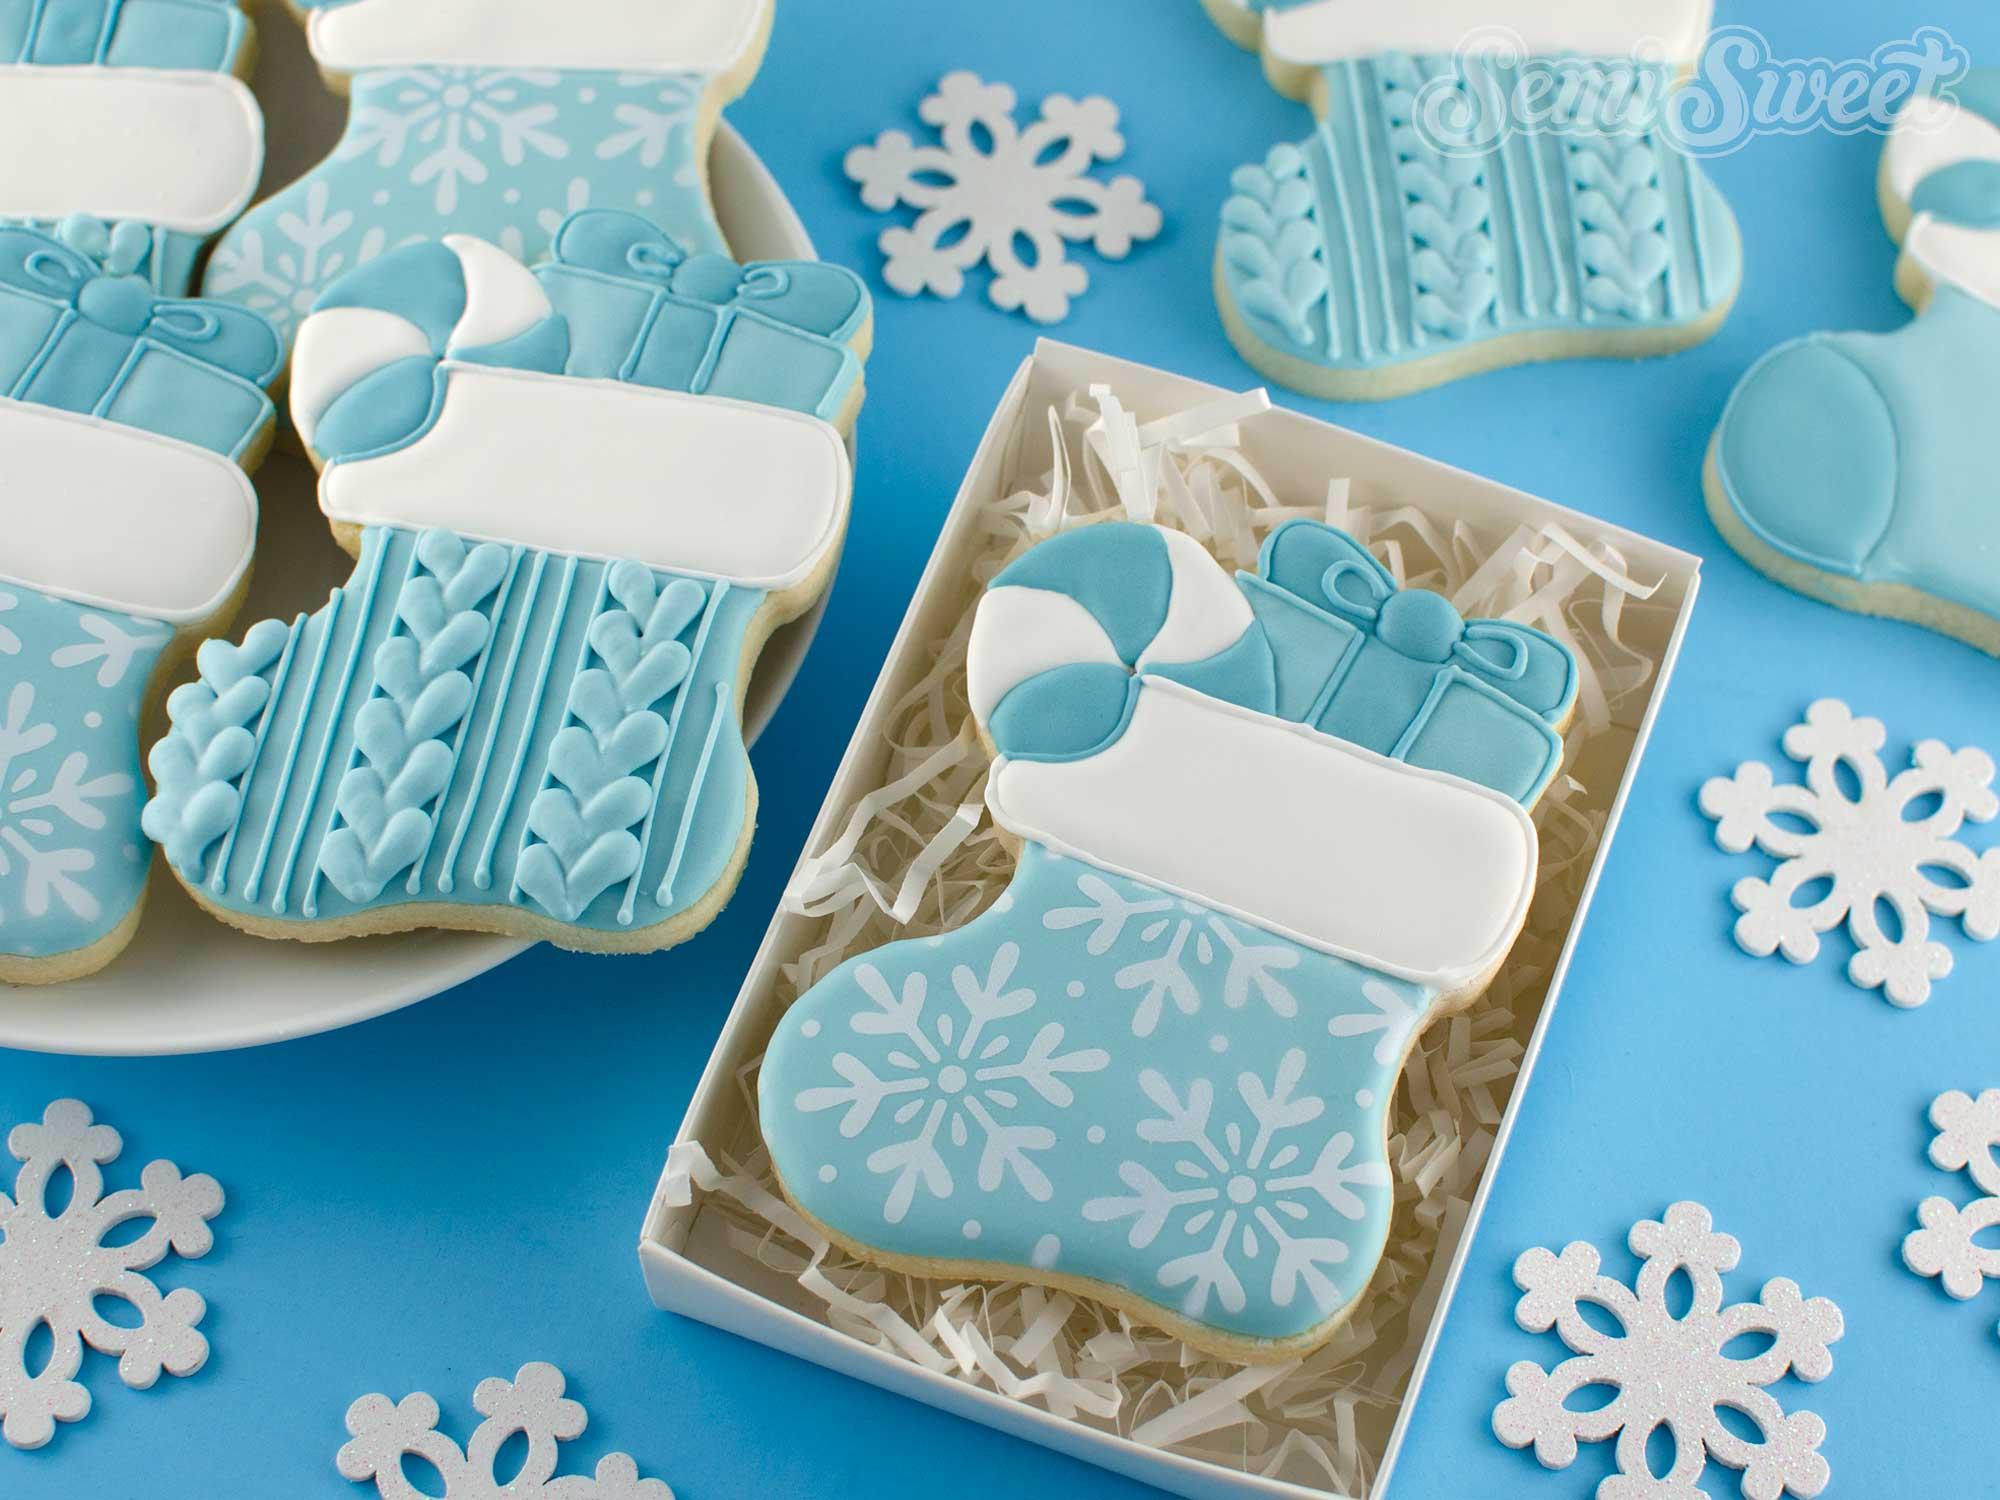 How to Make Christmas Stocking Cookies